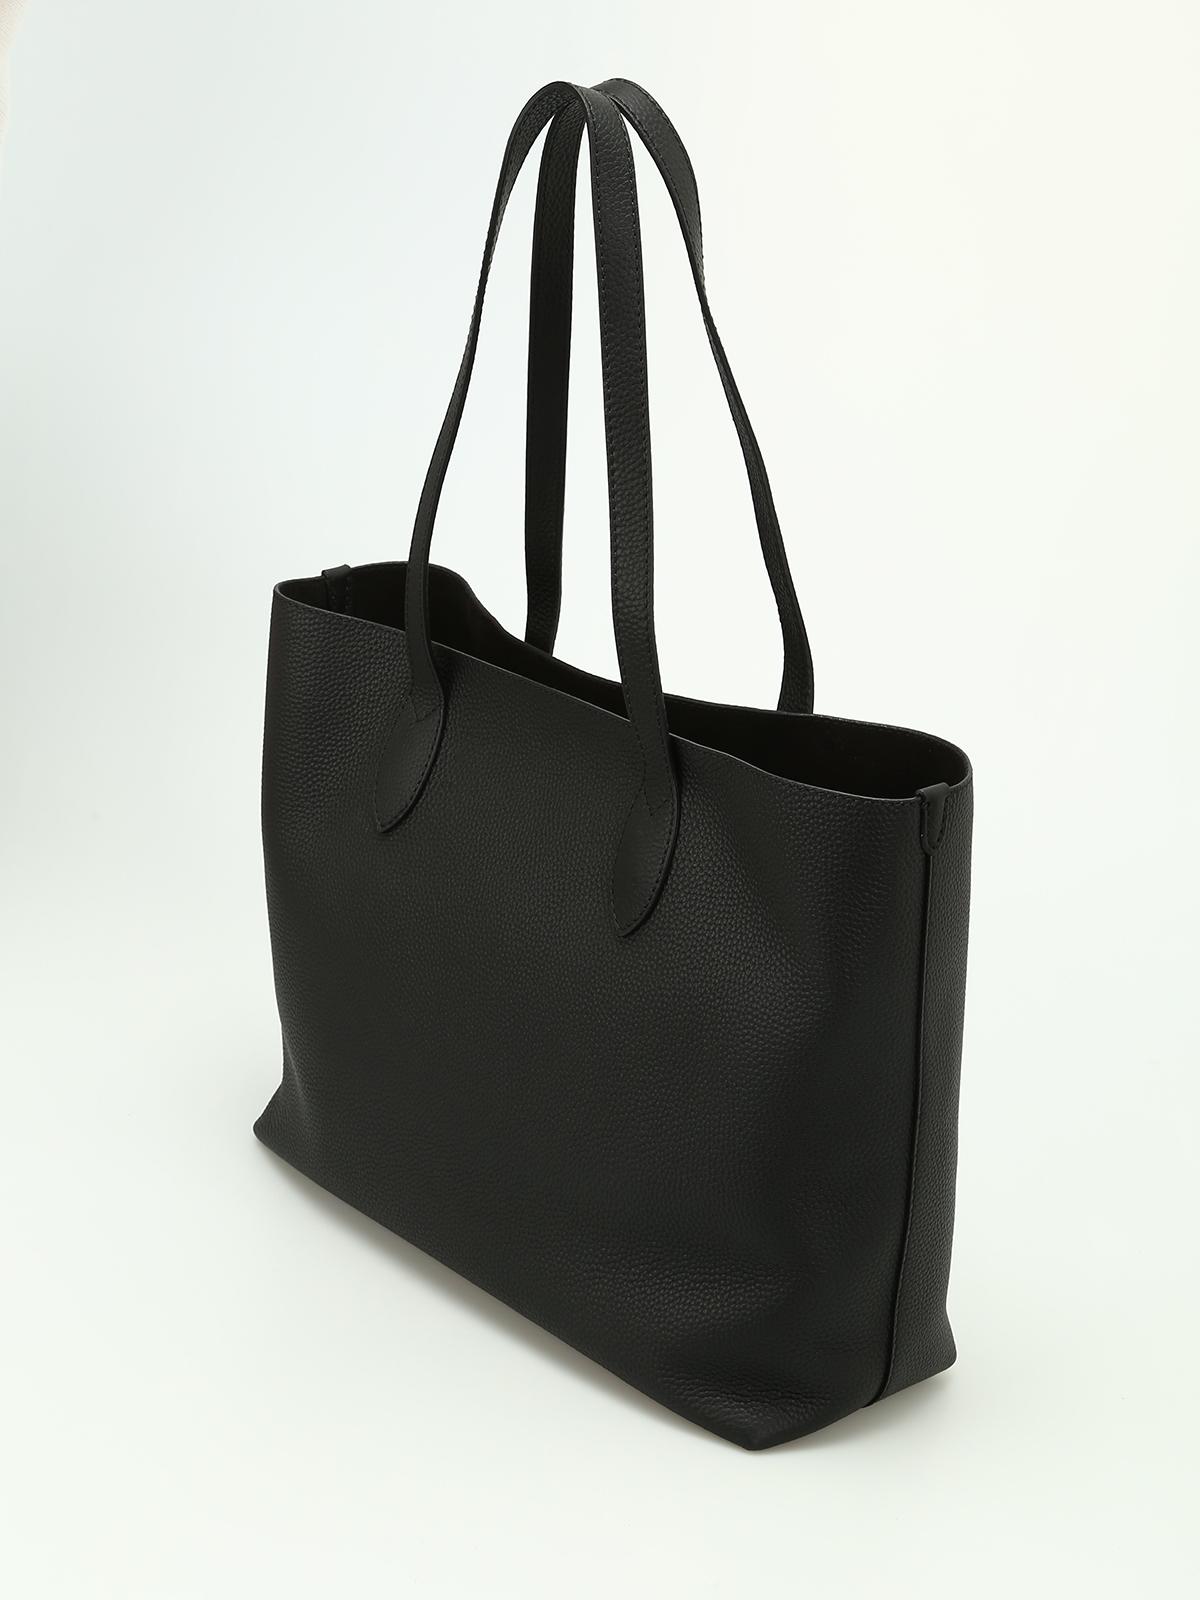 0983085fd9c14 Burberry - Shopper - Schwarz - Handtaschen - 4060096